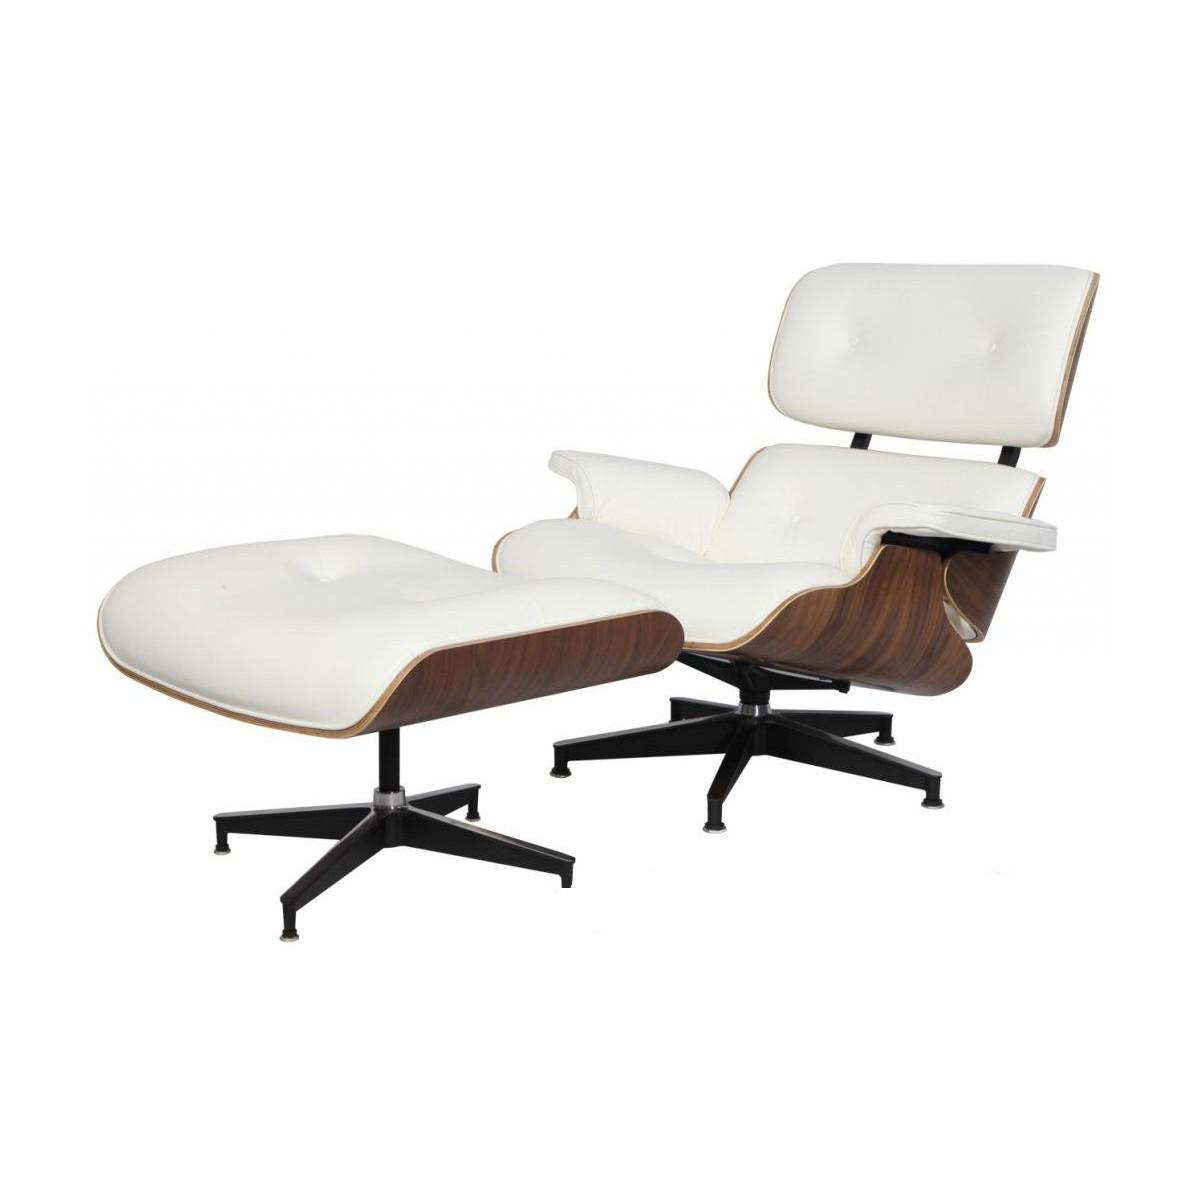 Eames style lounge chair ottoman white walnut